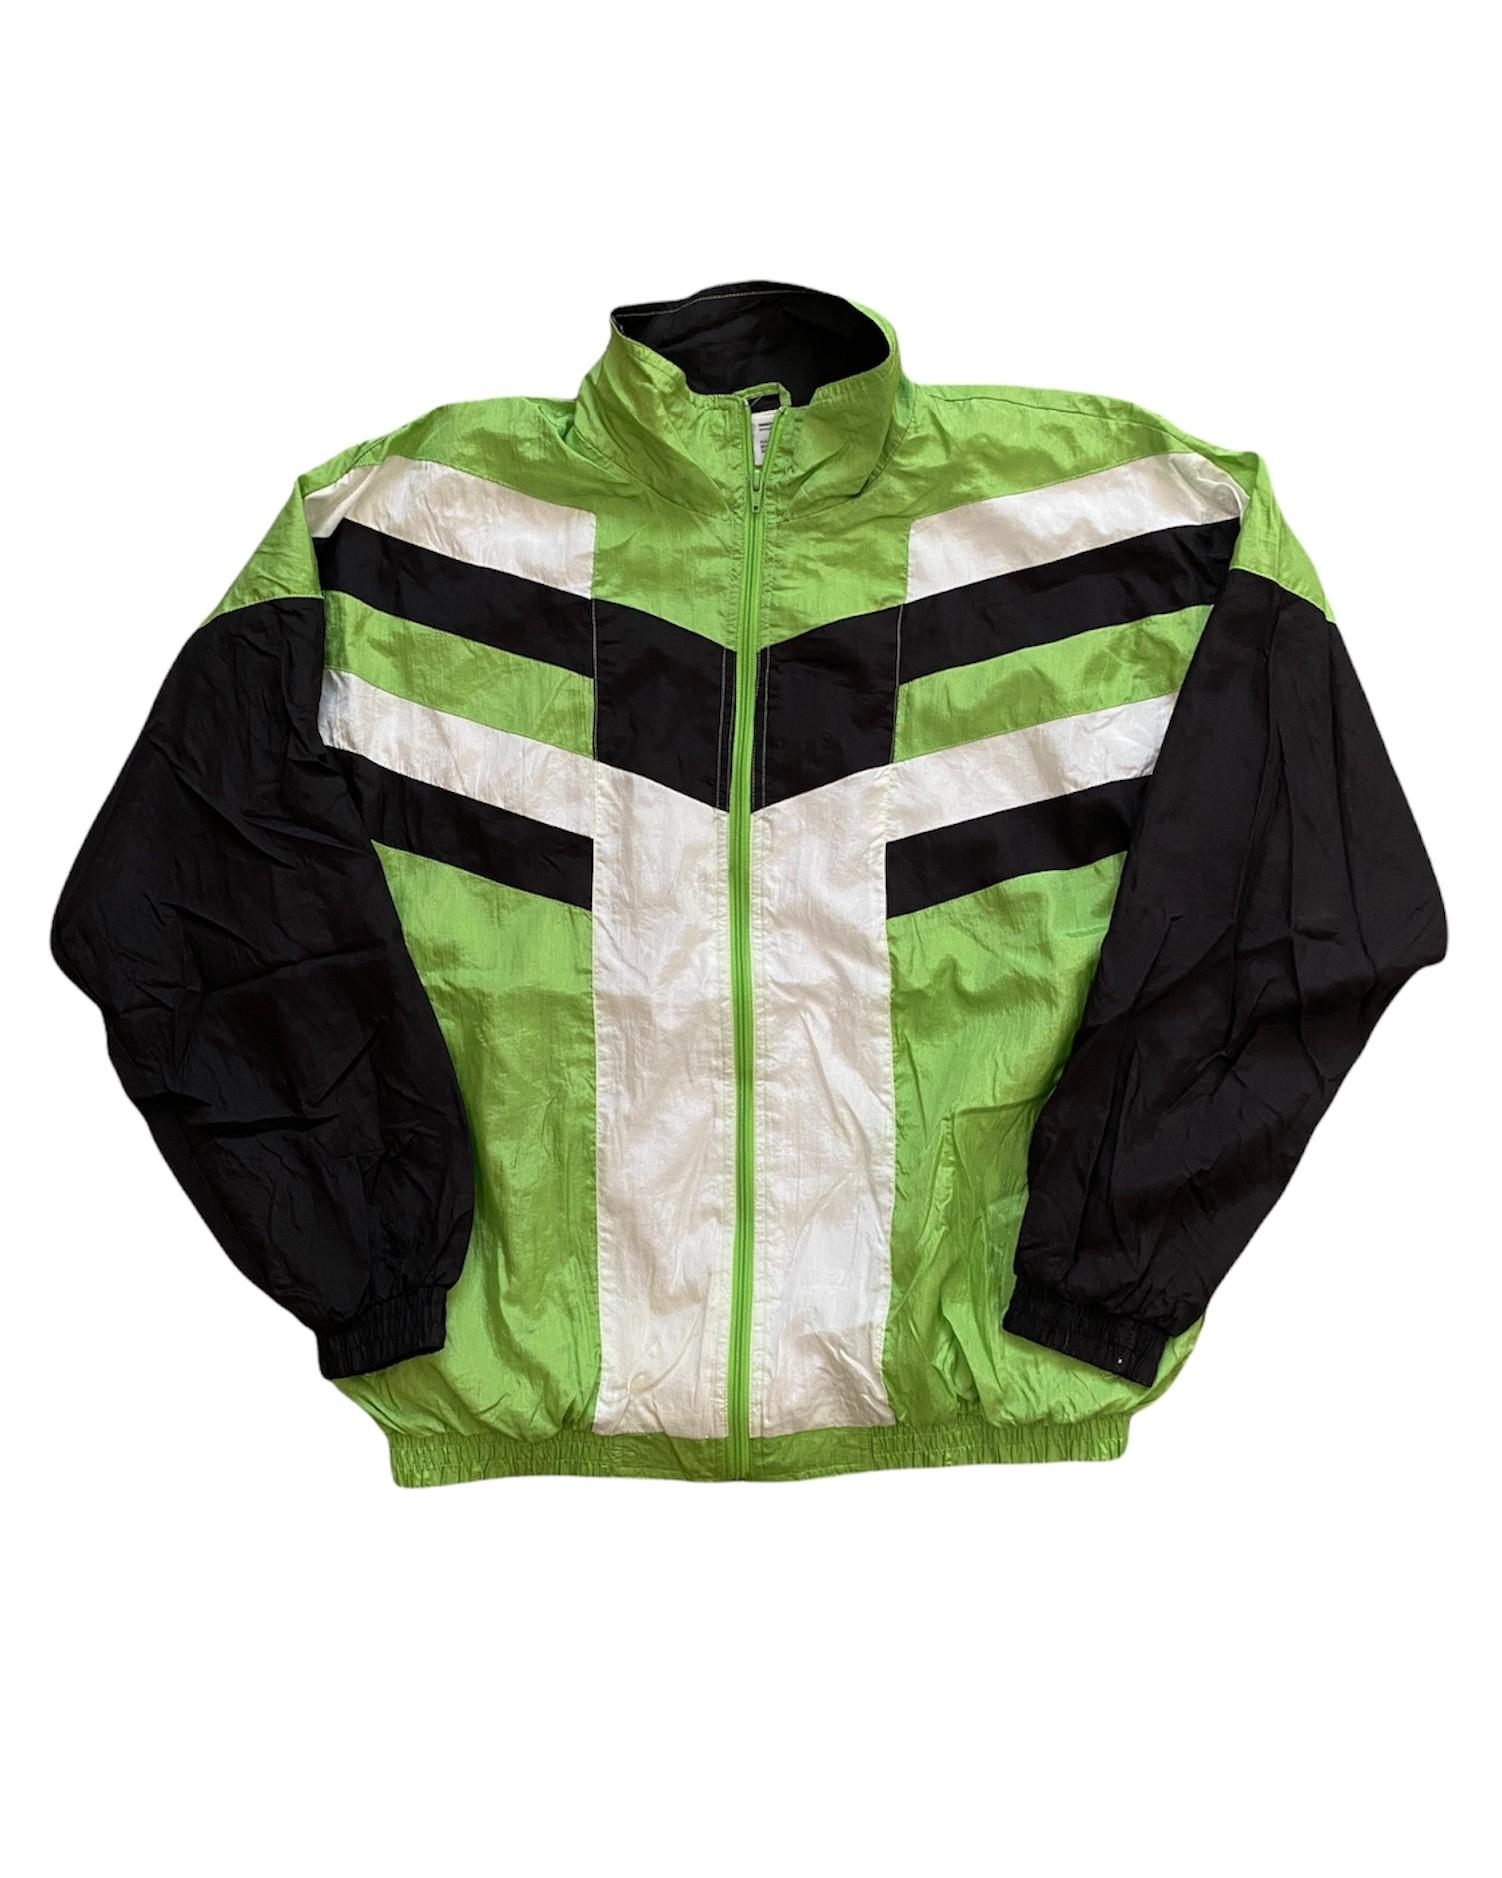 Green Black 90's Vintage Ceket (XL)